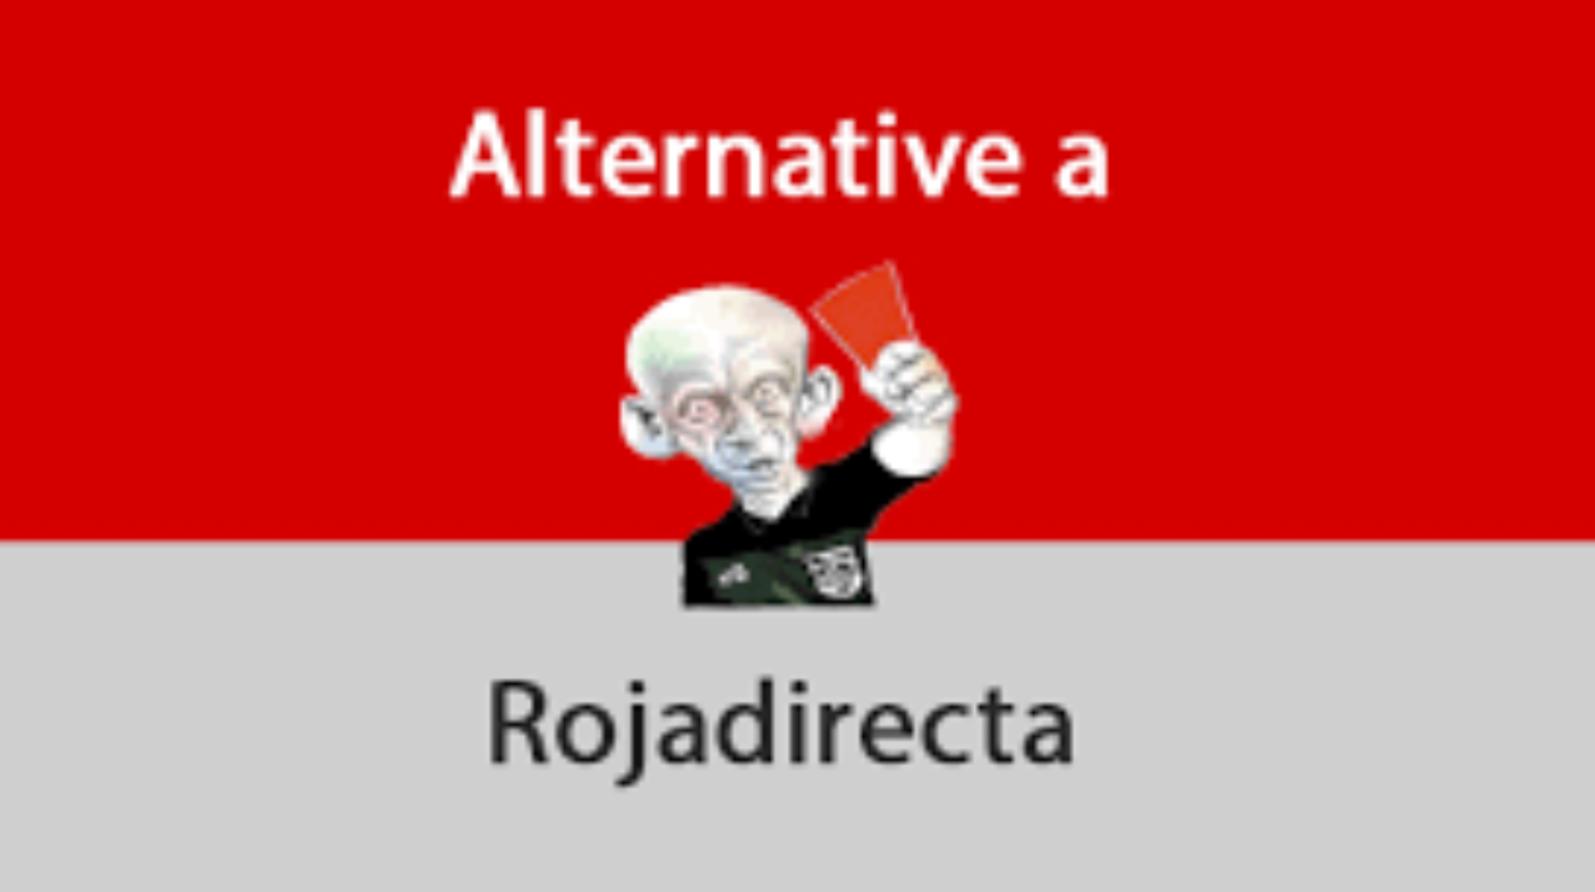 Rojadirecta Alternative